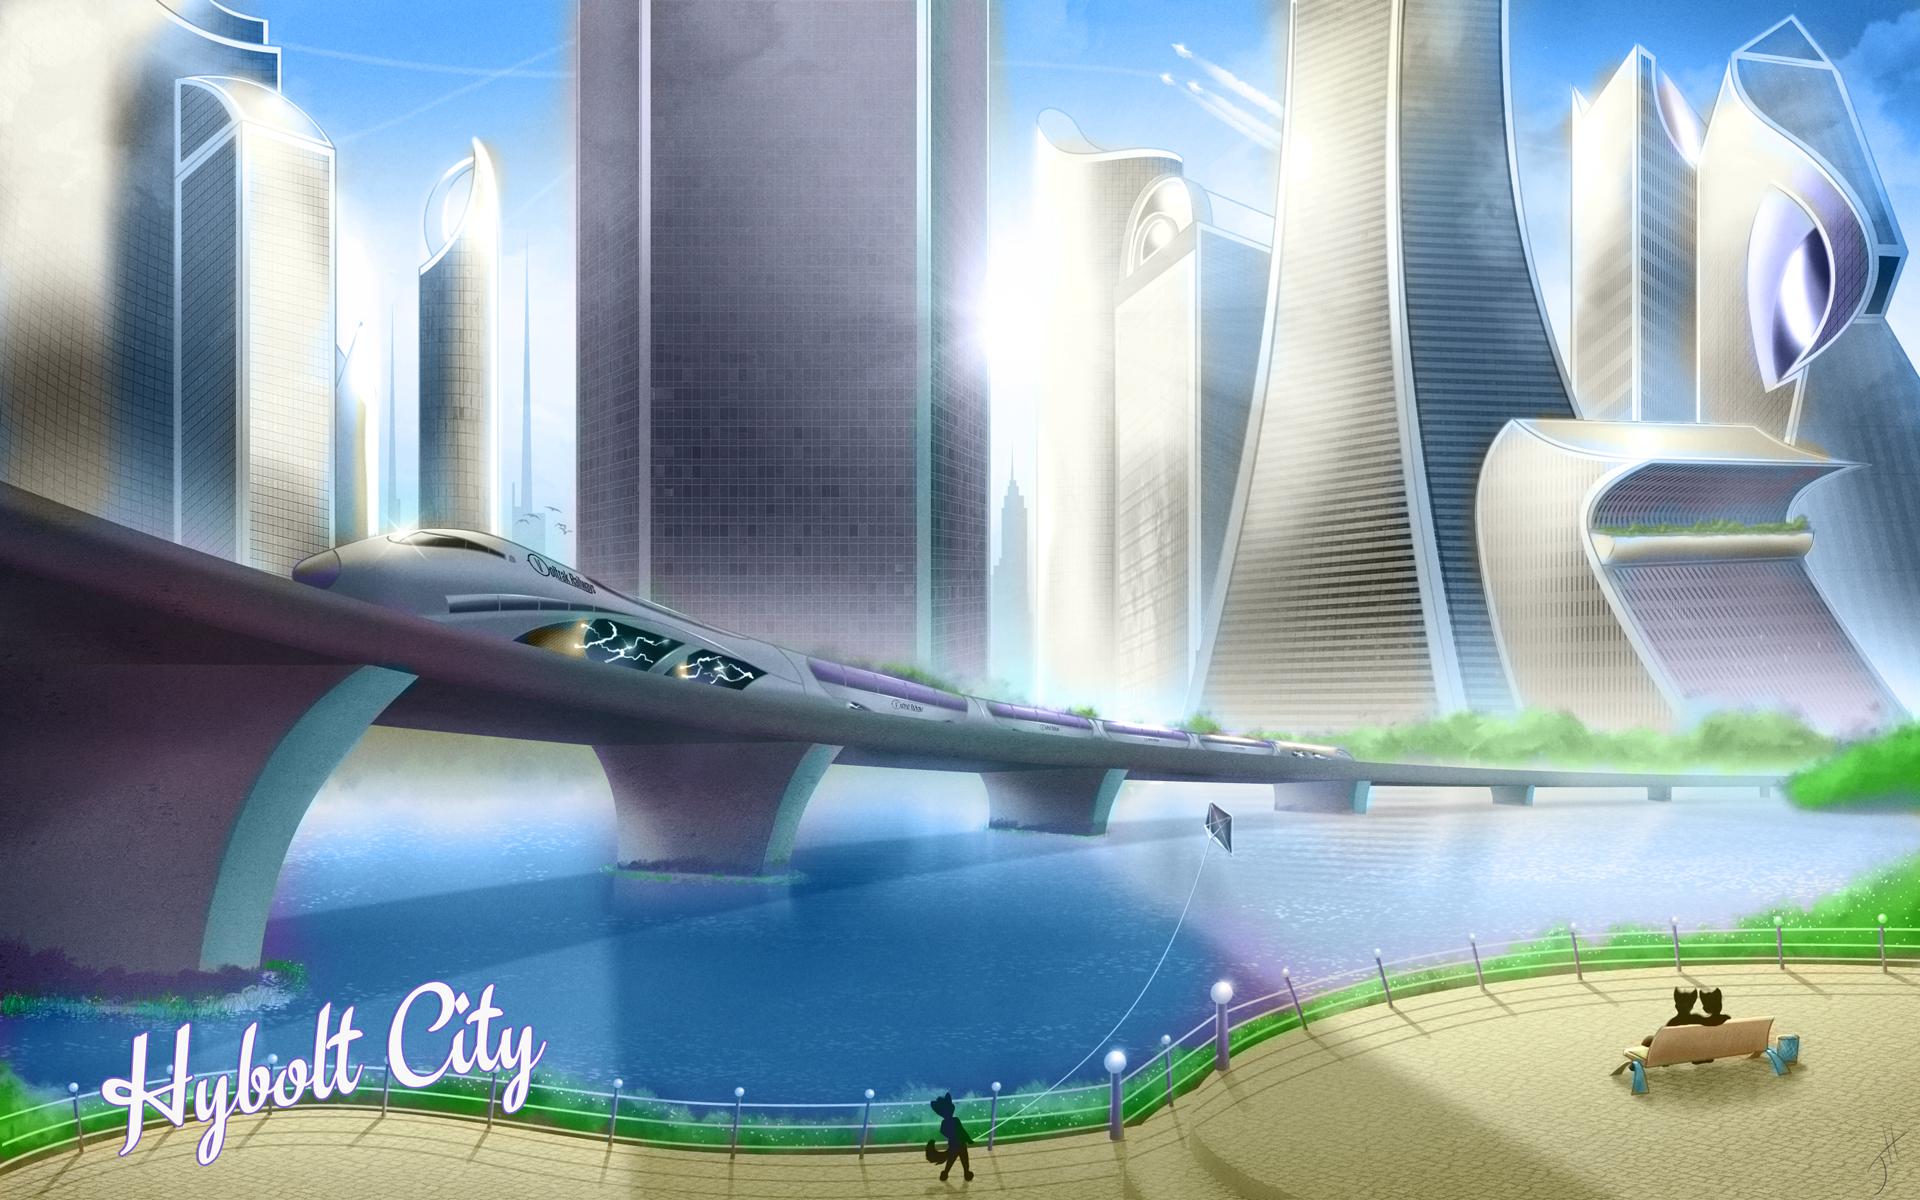 Welcome to Hybolt City